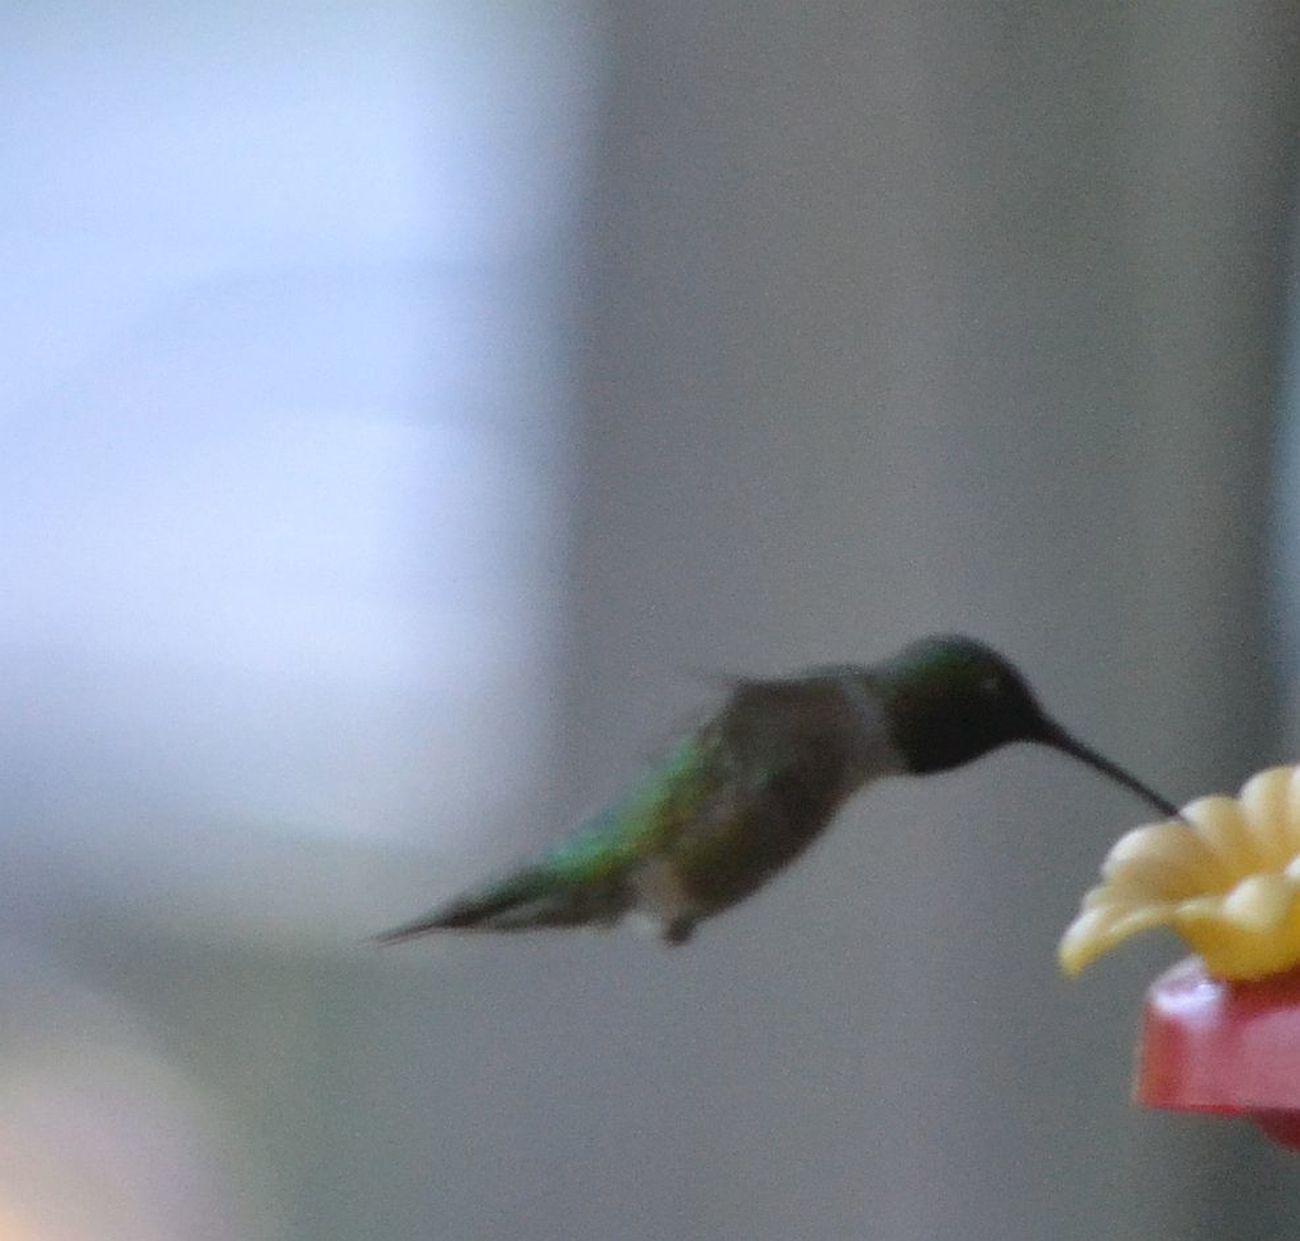 Humming Birds Seeking Nectar